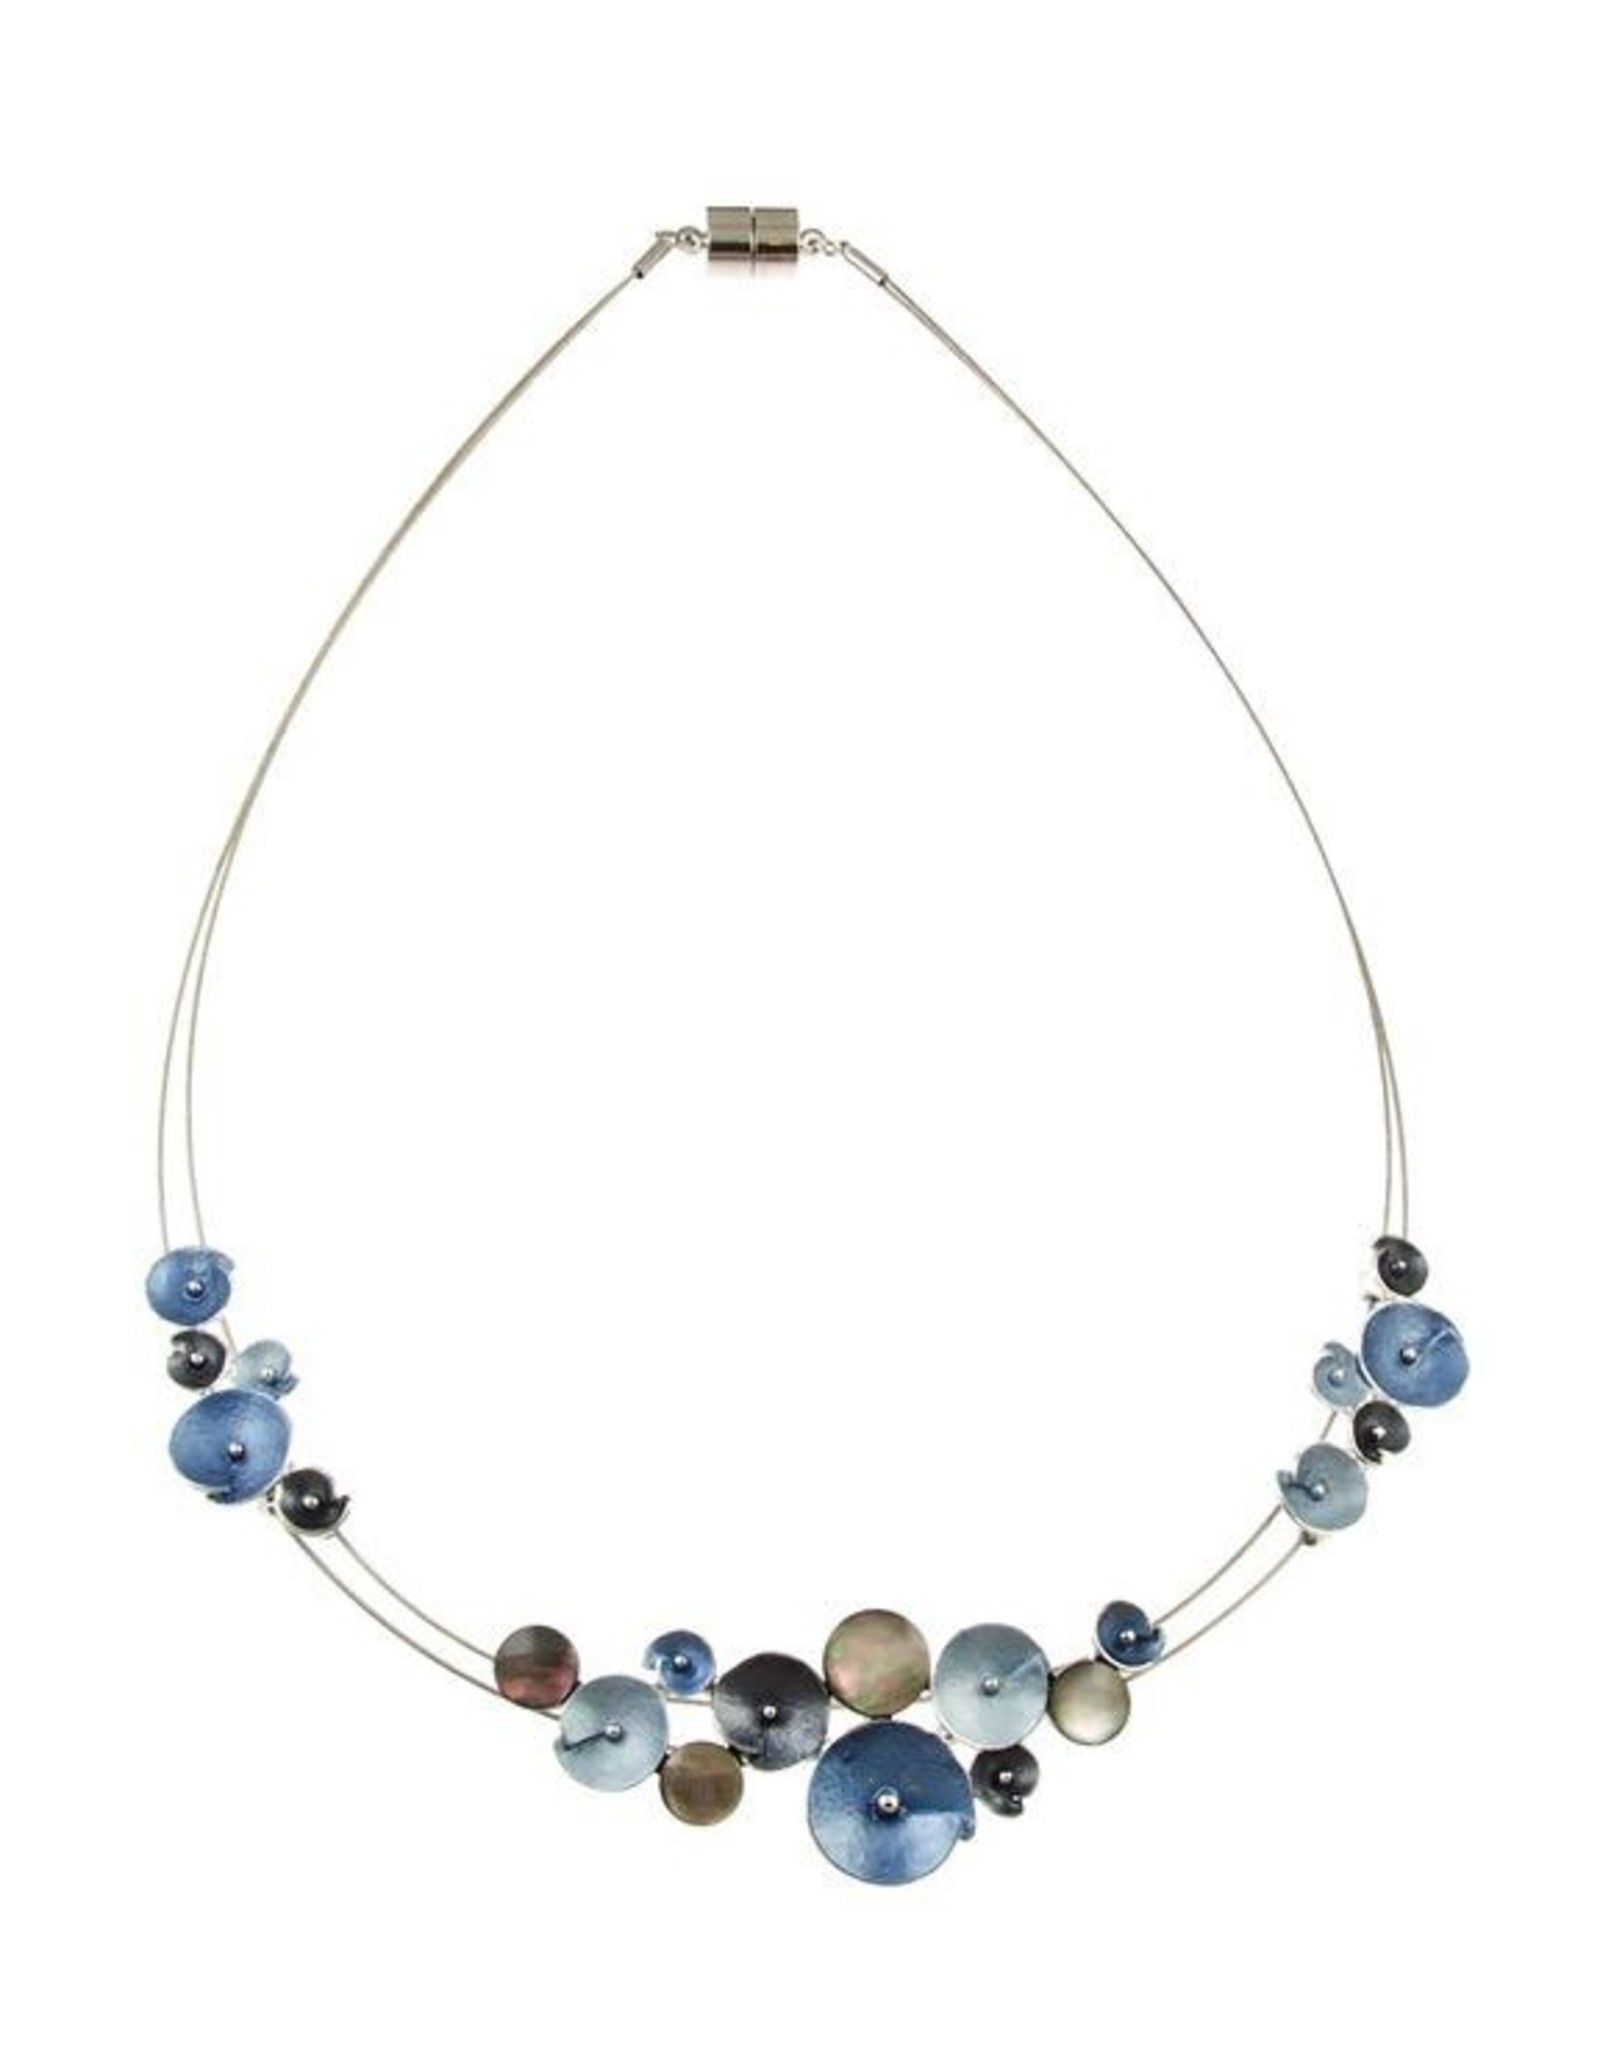 ORIGIN Metal Flower Necklace